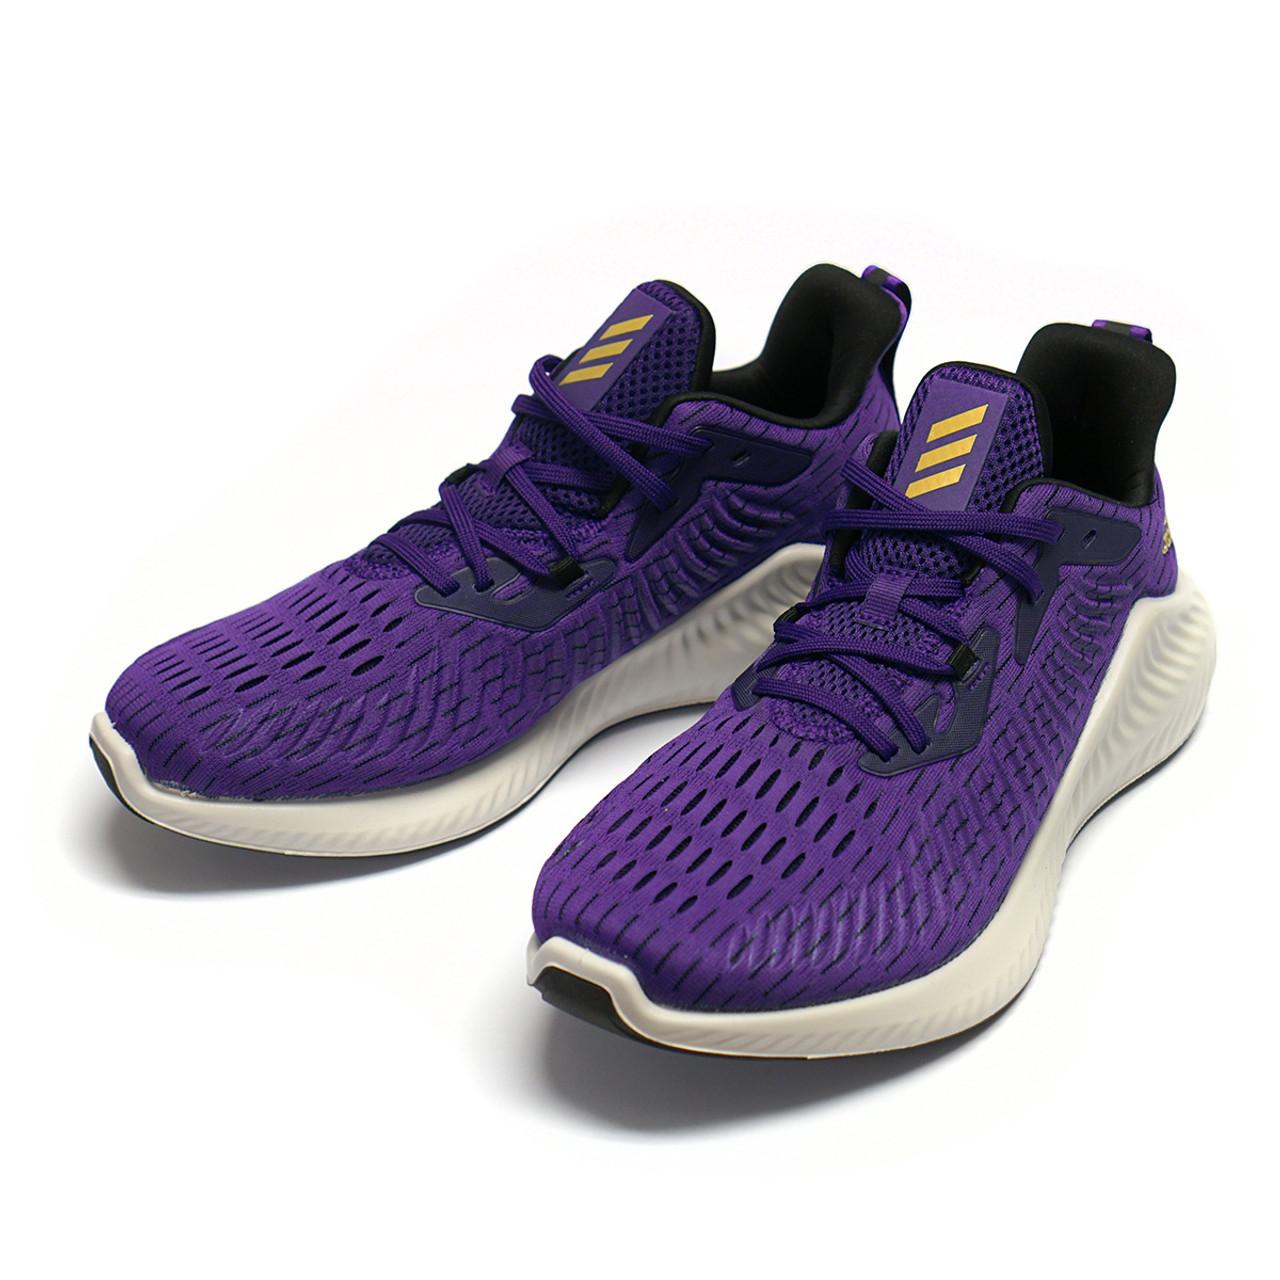 revendeur f062c 742b3 Purple 2019 AlphaBounce + Run Metallic Adidas Shoes